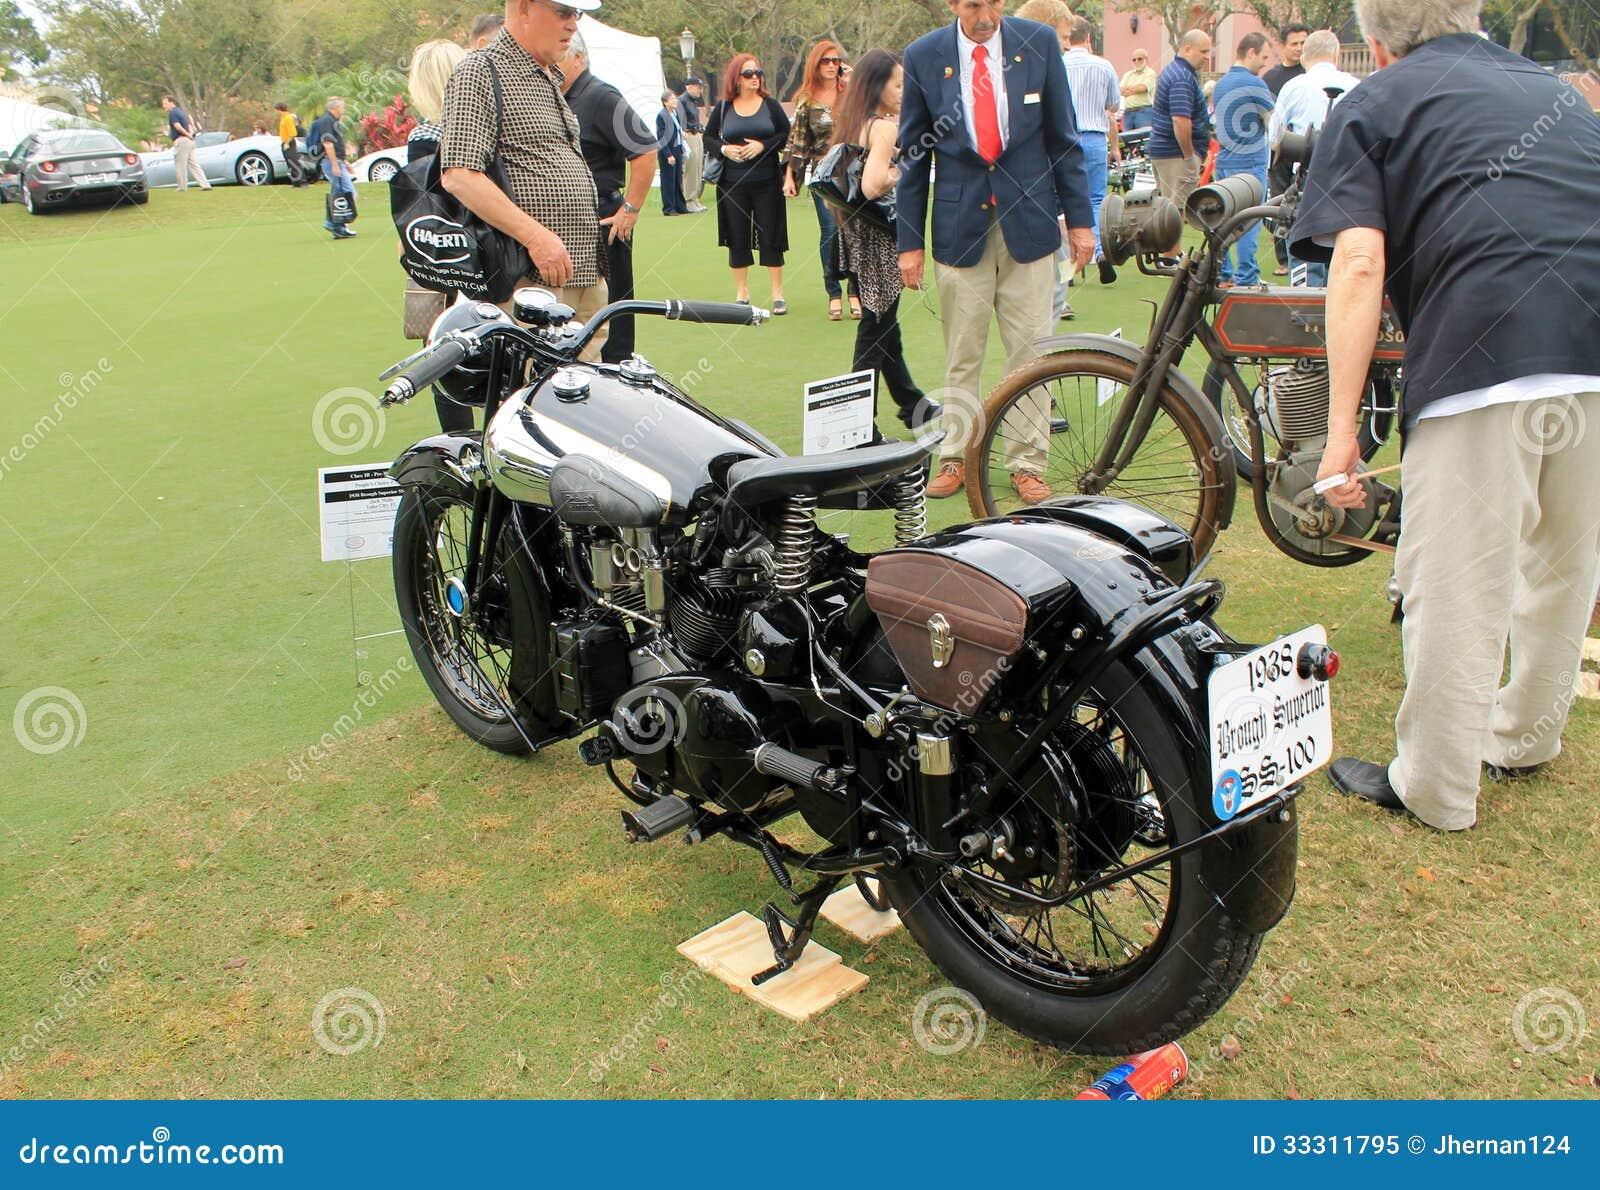 Vintage 1930s British Motorcycle Editorial Image - Image of